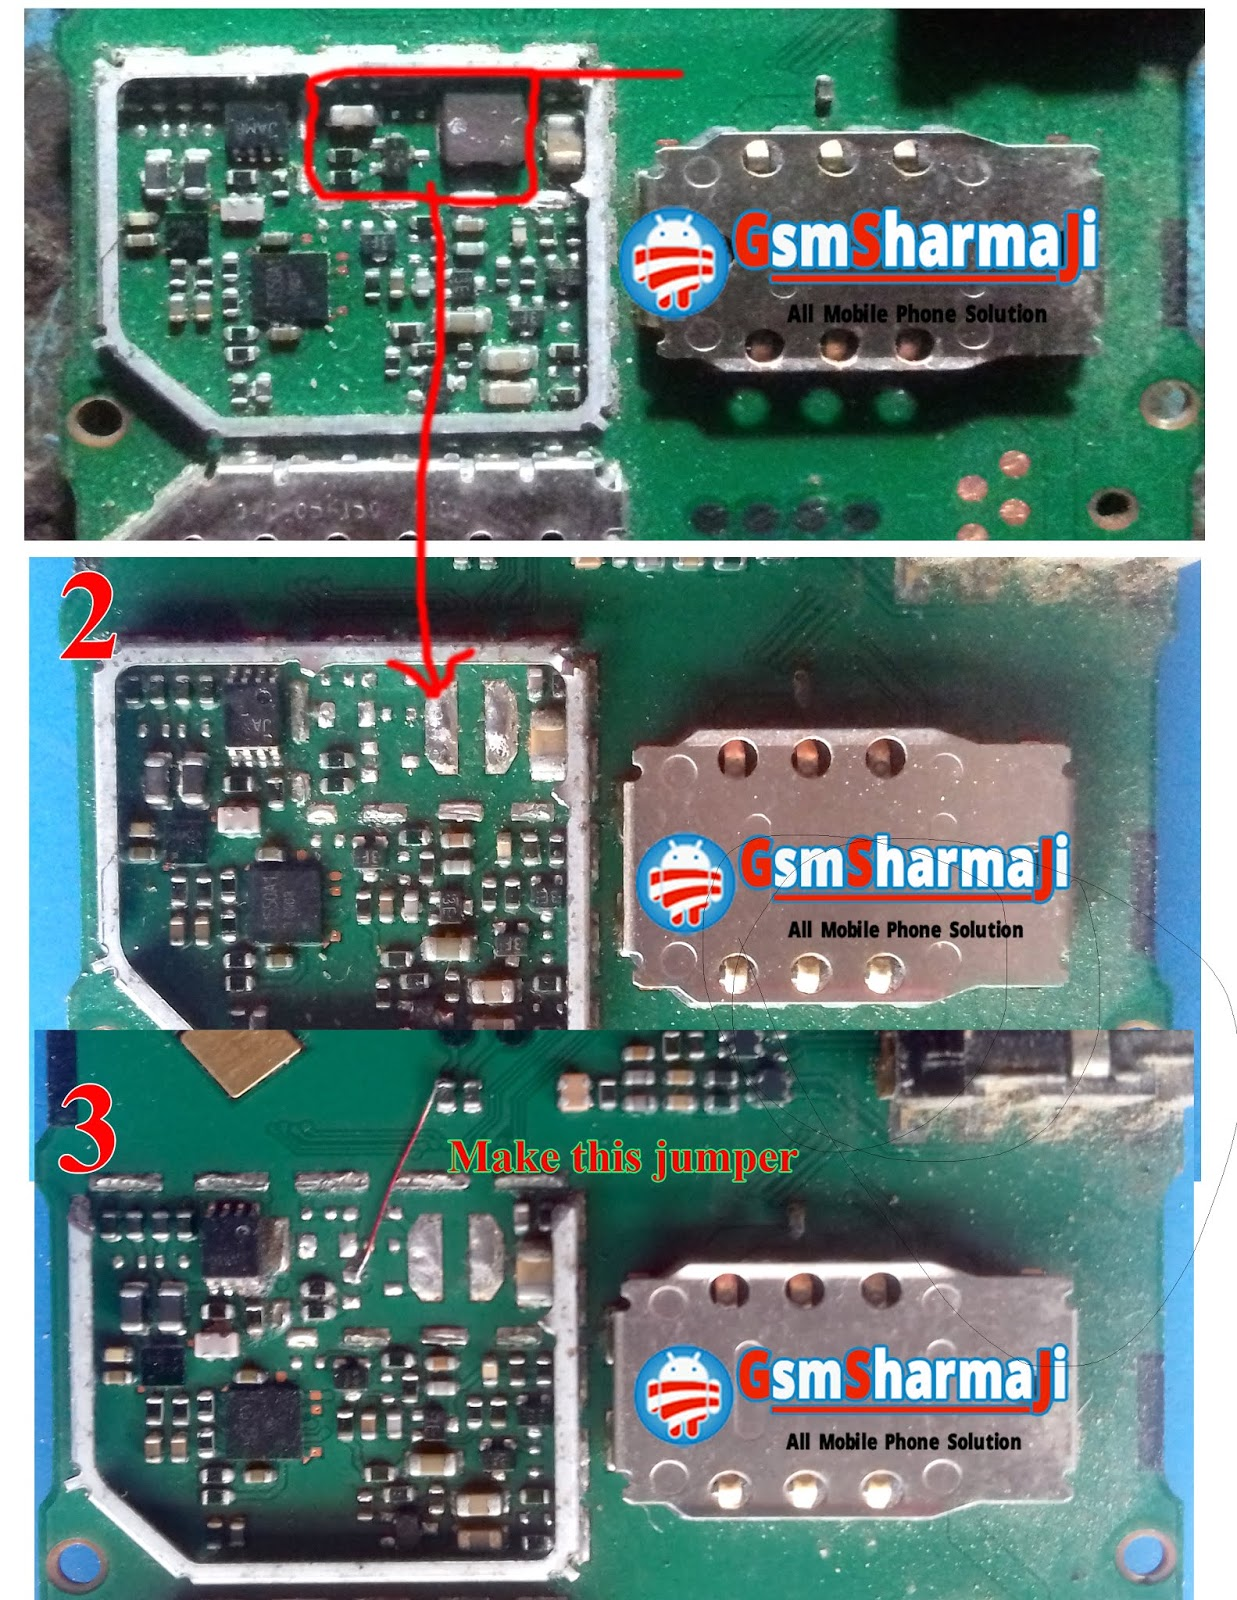 Nokia 1202 Display Light Repair Light Problem Solution